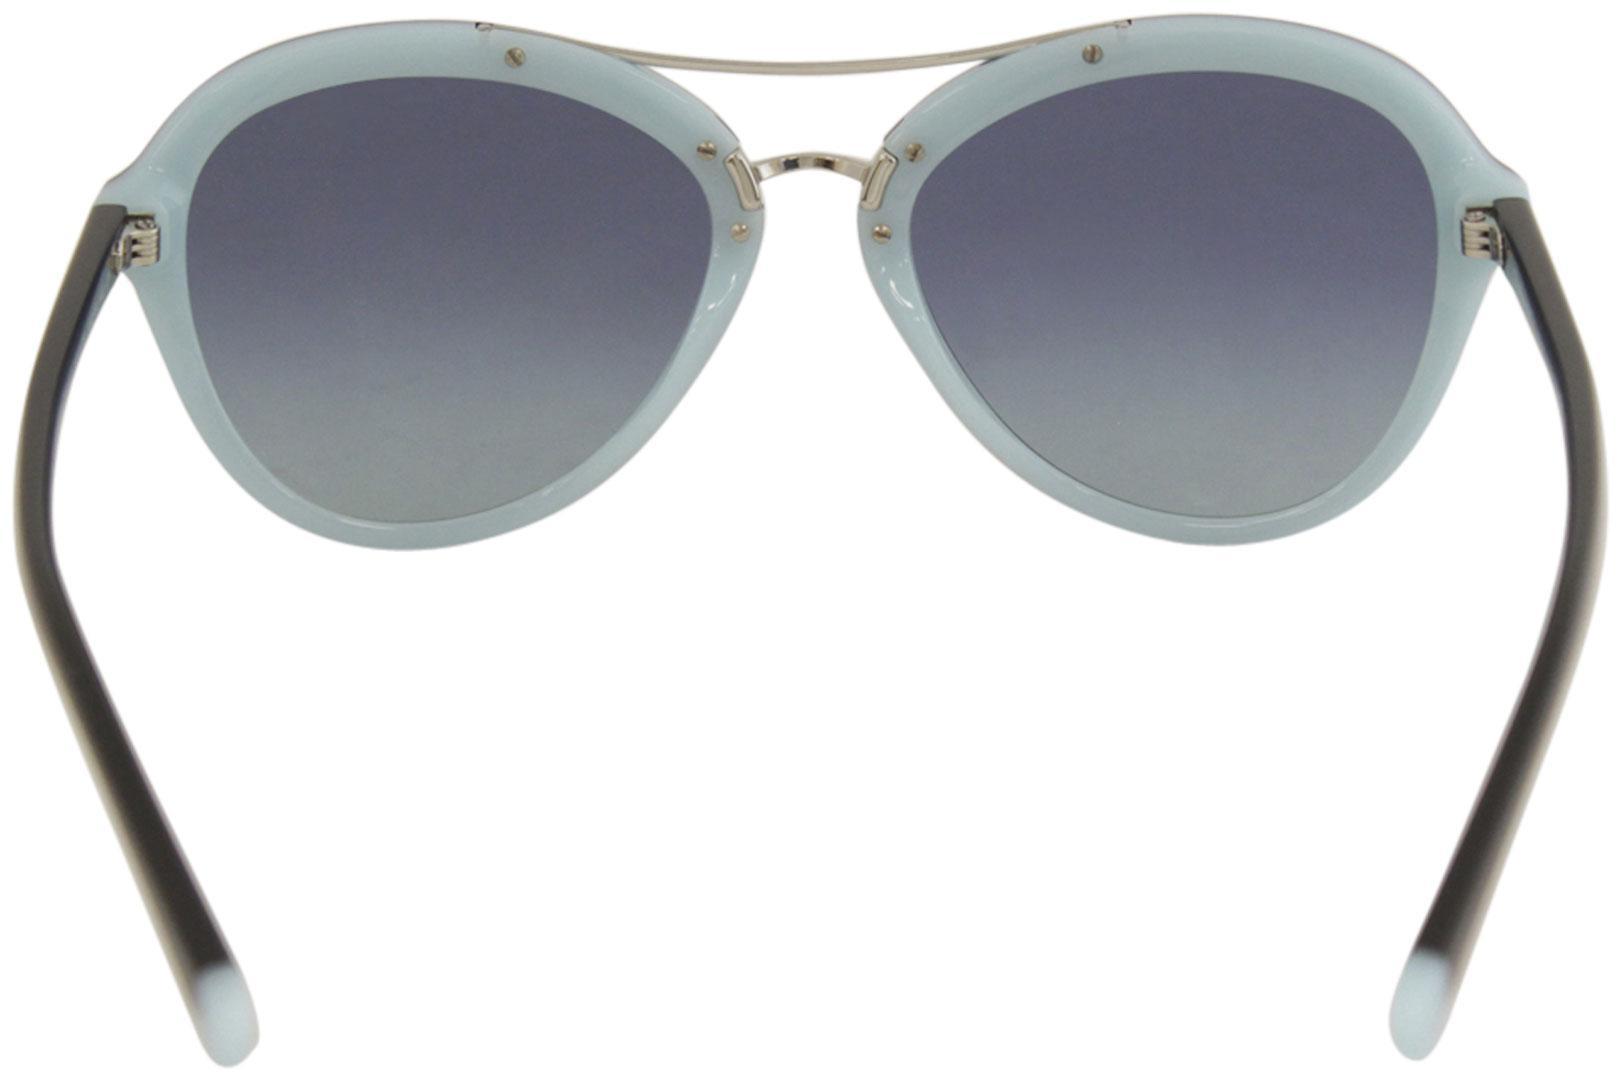 d5383b0ad2 Tiffany   Co. Women s TF4157 TF 4157 Fashion Pilot Sunglasses